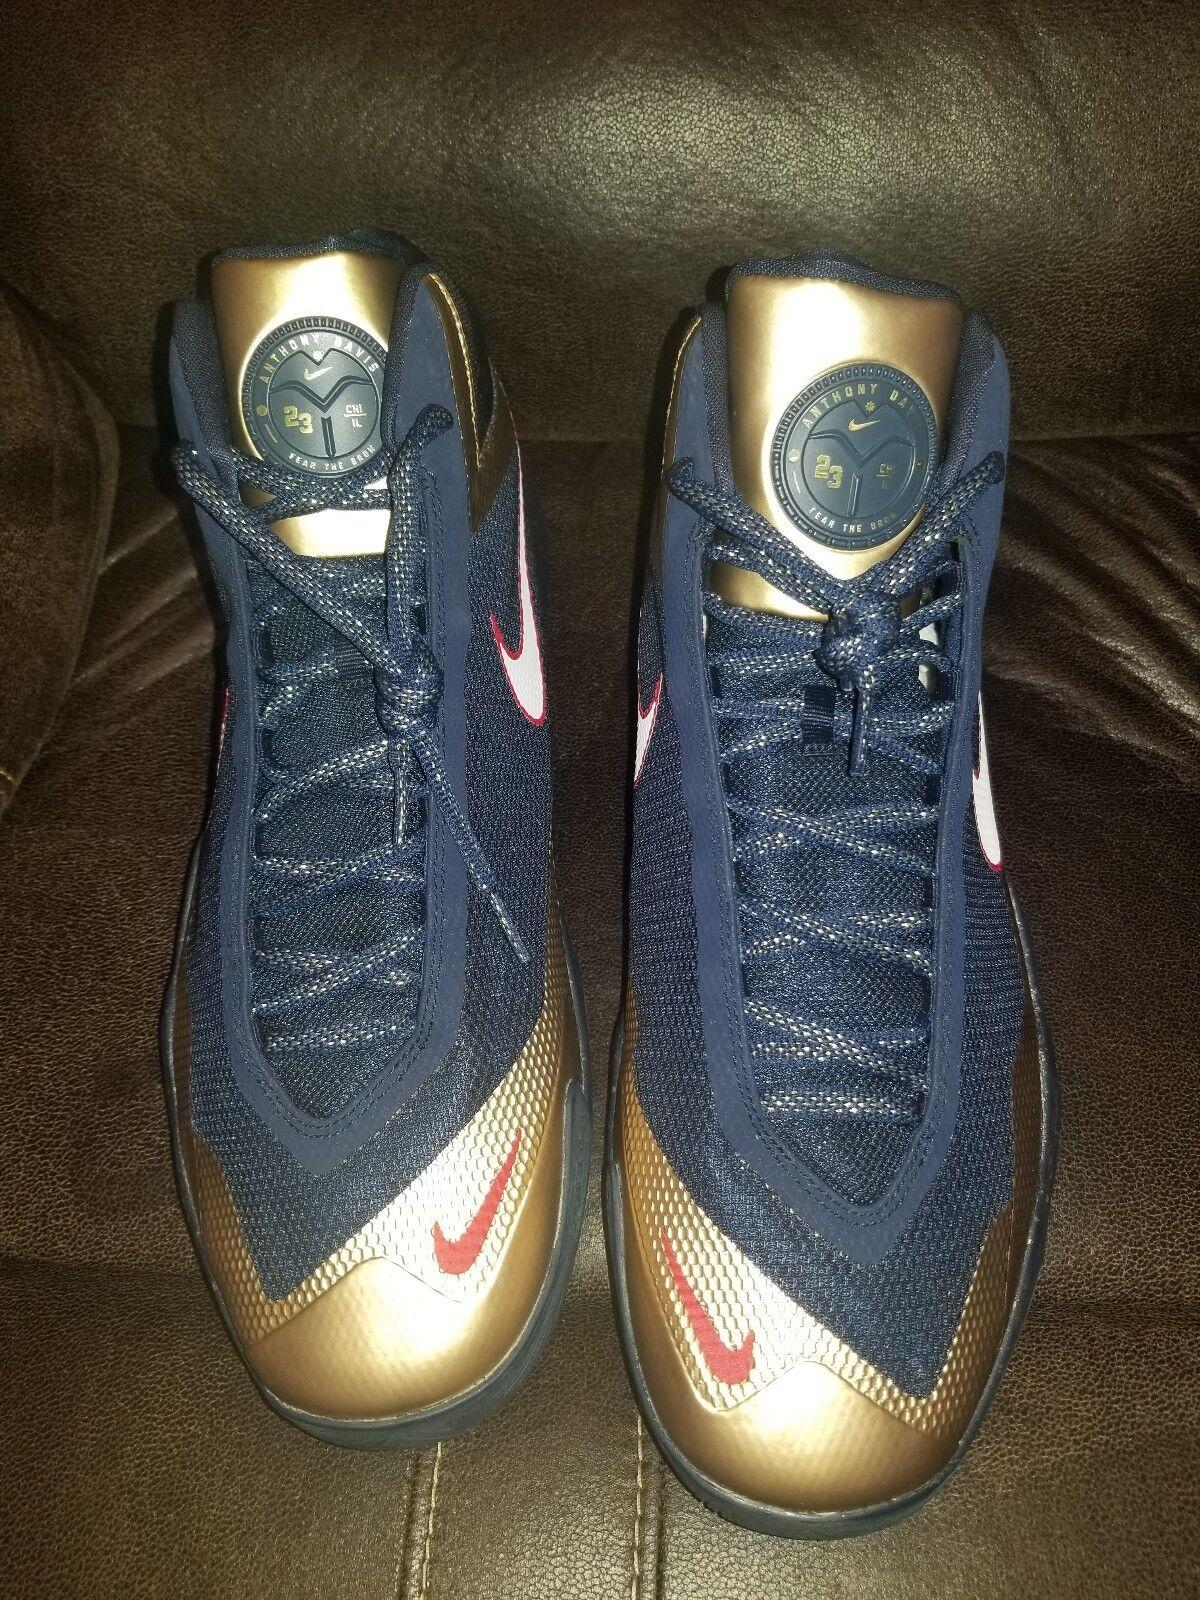 Nike air trainer Uomo sc alta Uomo trainer 302346-402 leche blu turchese scarpe numero 15 21c138